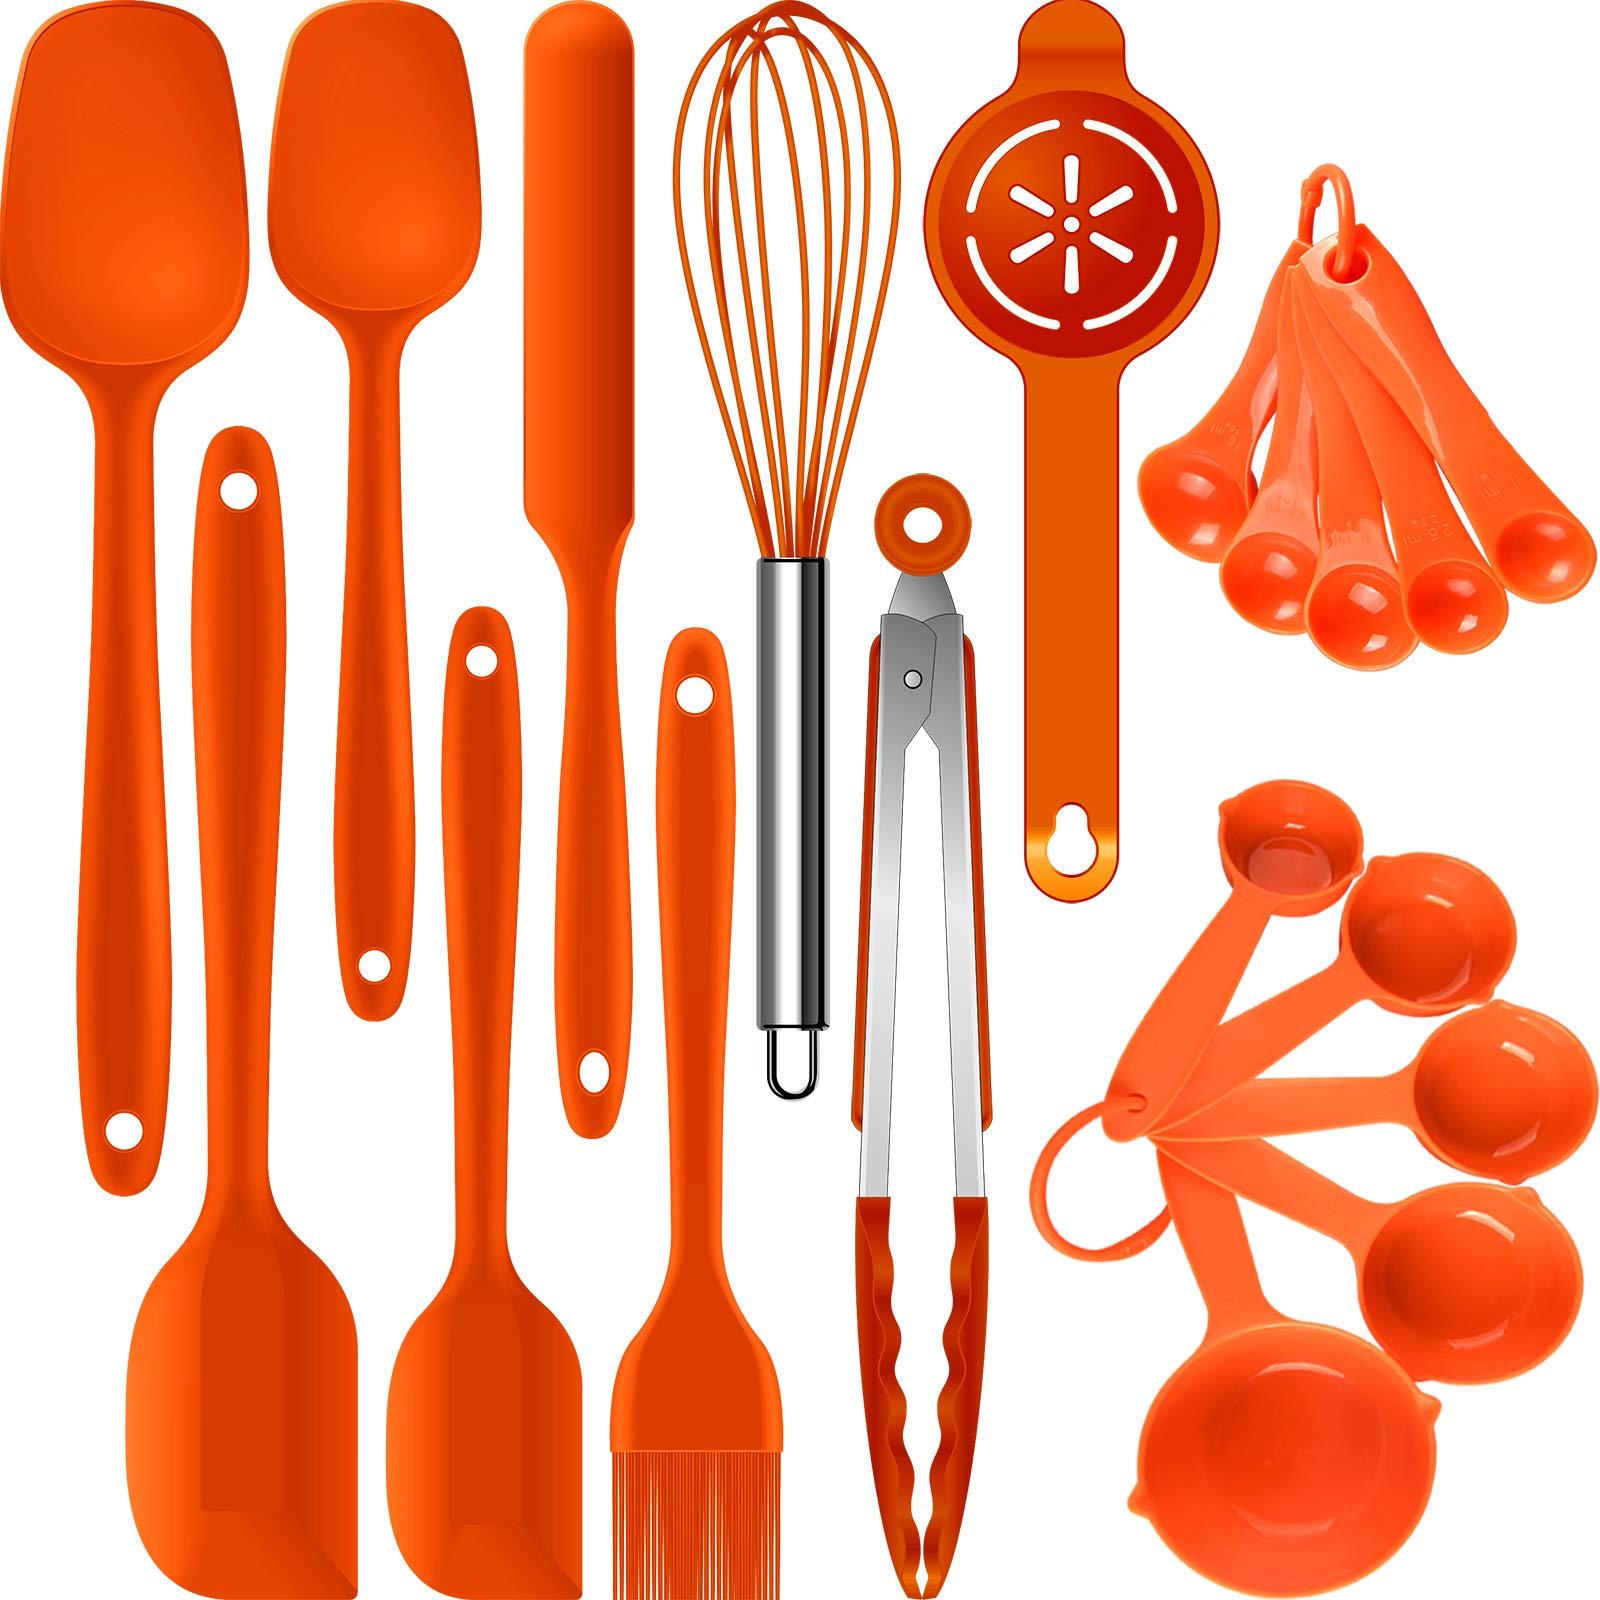 Silicone Spatula Set - Spatulas Heat Resistant,Rubber Spatula Set, Mixing/Baking Utensils,Cooking Spatulas for Nonstick Cookware,Kitchen Spatula Tools,BPA-Free. Dishwasher Safe.(Orange)